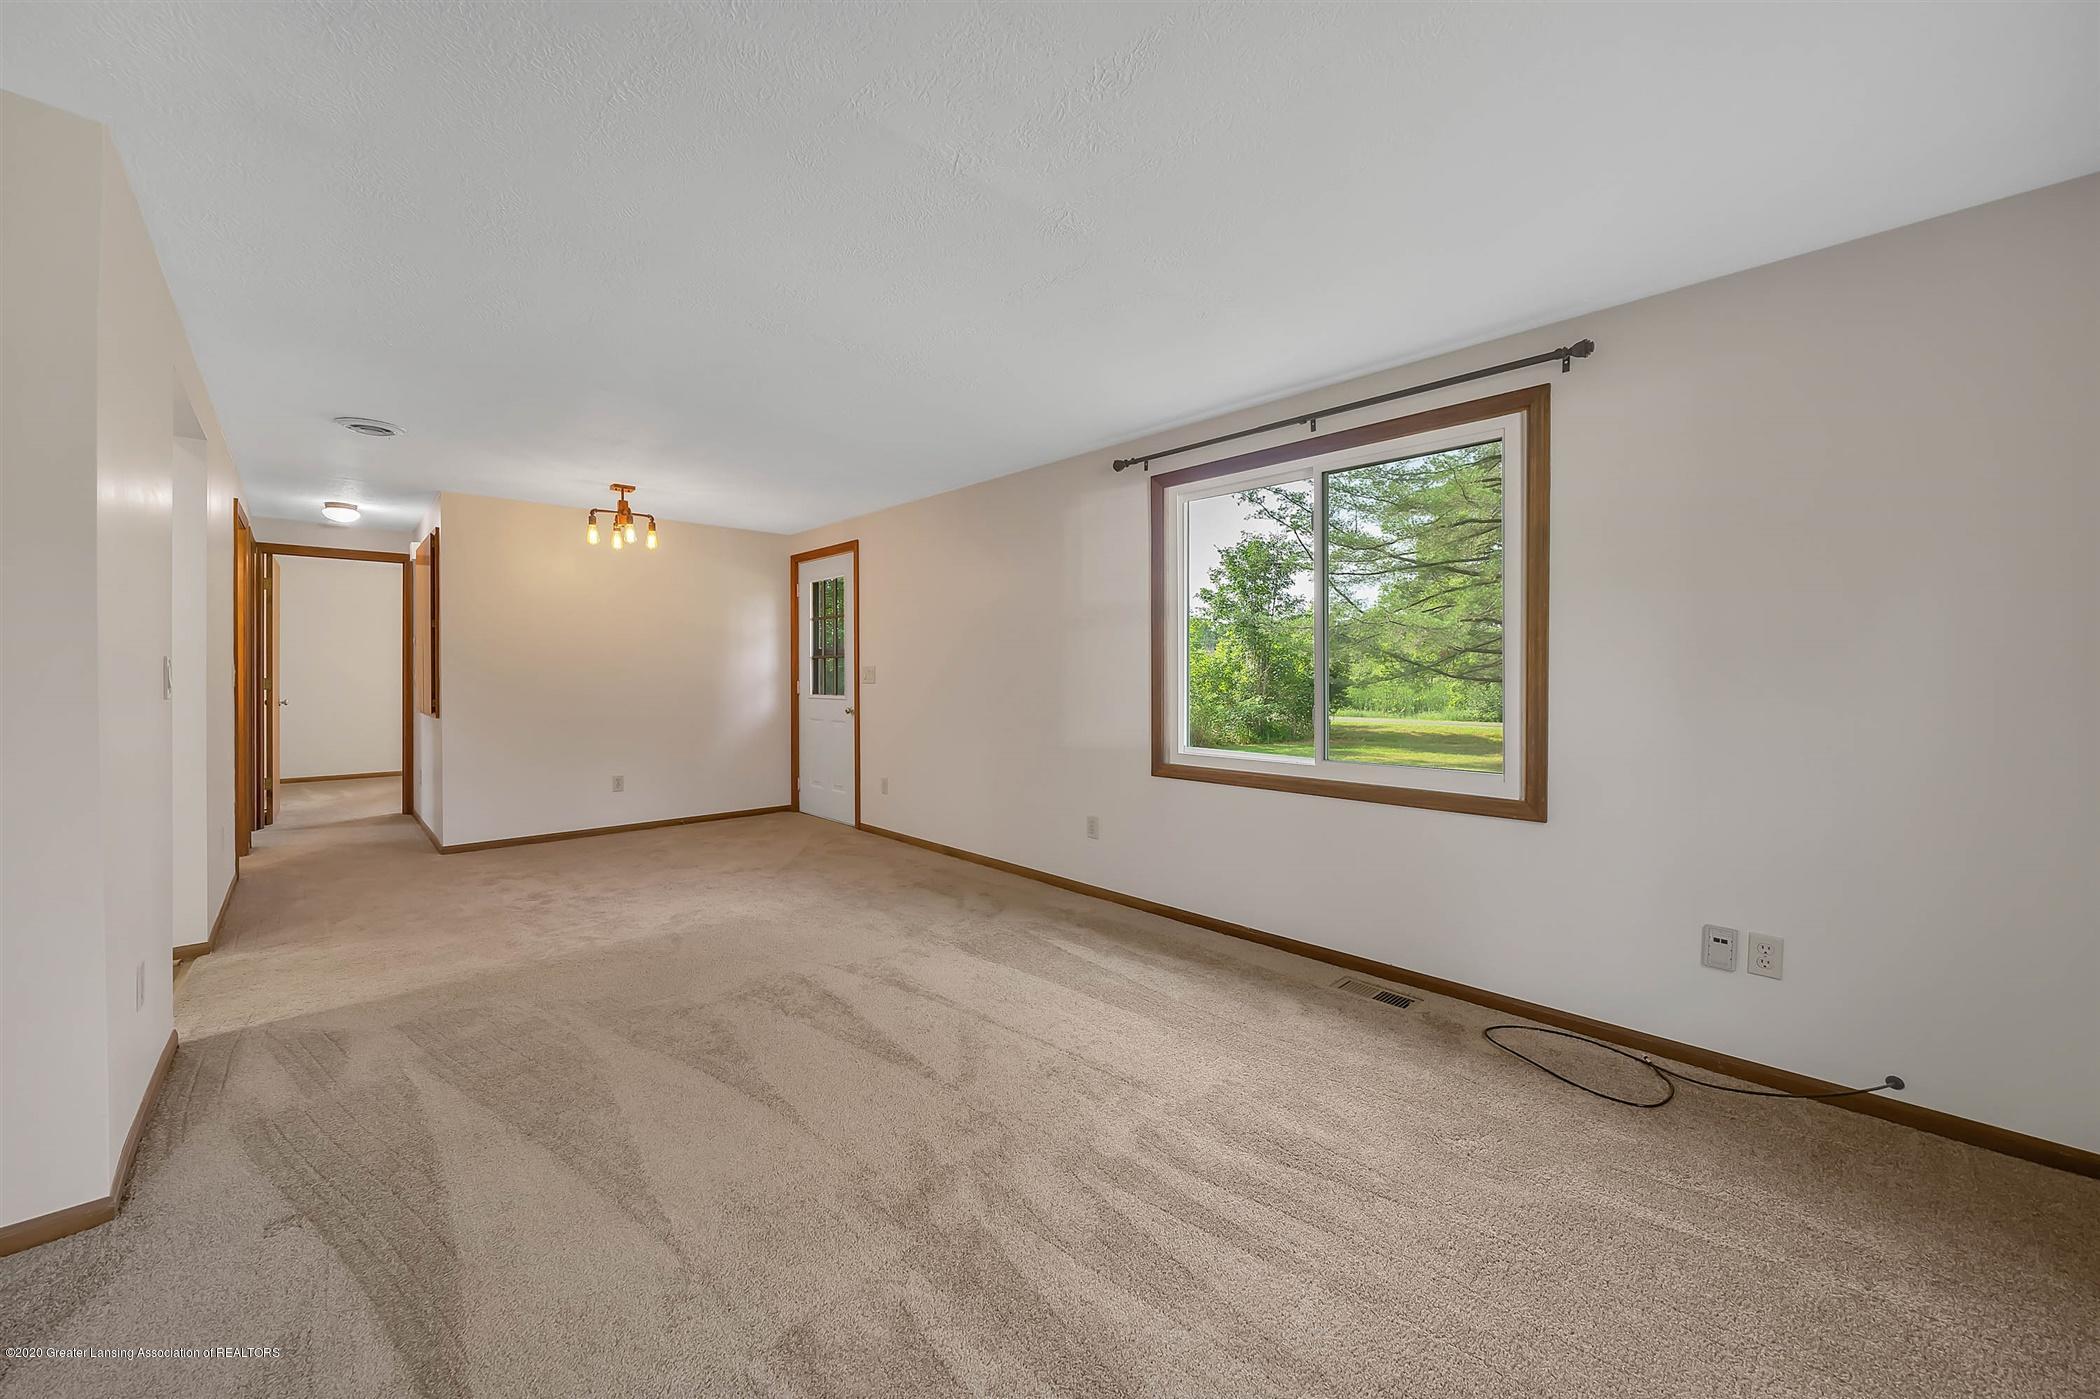 6750 W Lovejoy Rd - (7) 6750 Lovejoy Living Room - 7